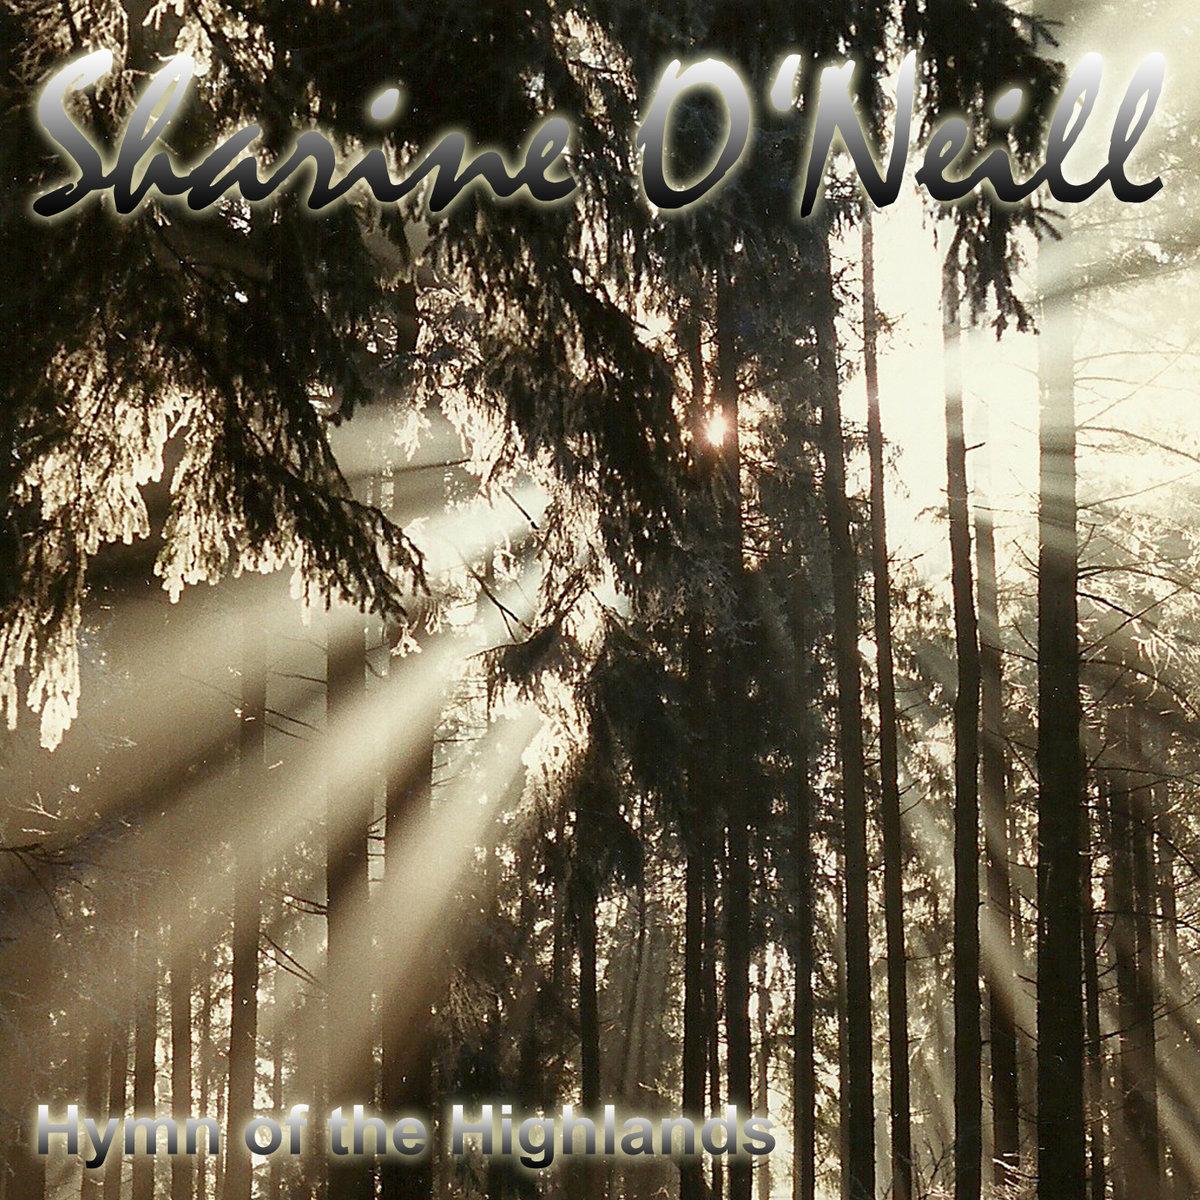 Hymn of the Highlands | Sharine O\'Neill